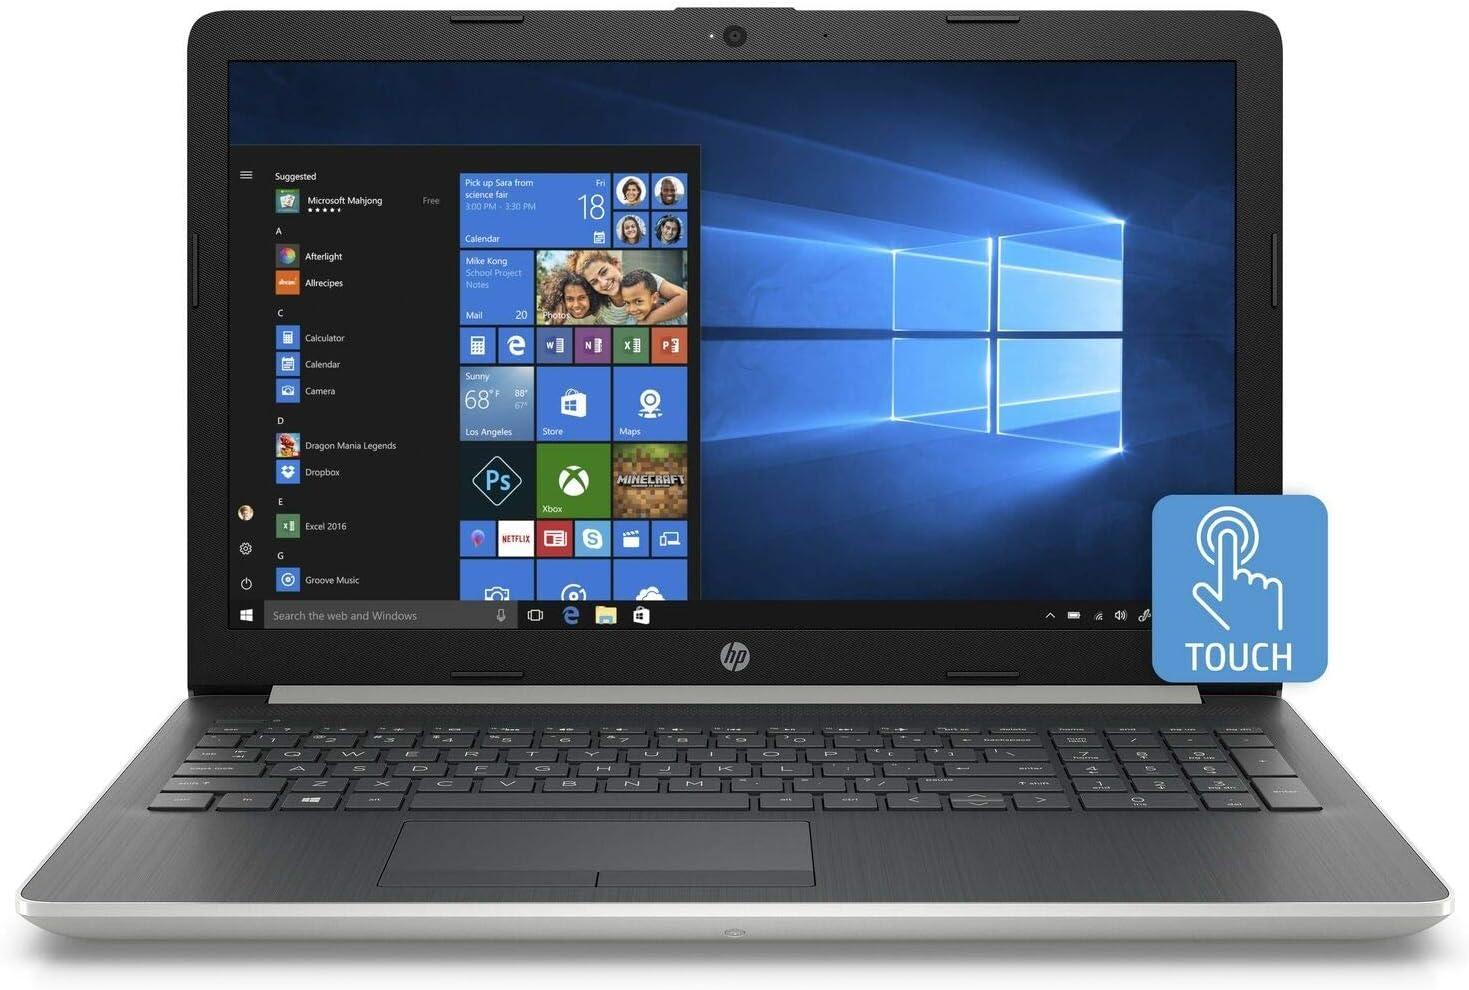 "HP 15-da0053wm 15.6"" Touchscreen Notebook PC - Intel Core i5-8250U 1.6GHz 4GB 16GB Intel Optane 1TB HD DVDRW Windows 10 (Renewed)"